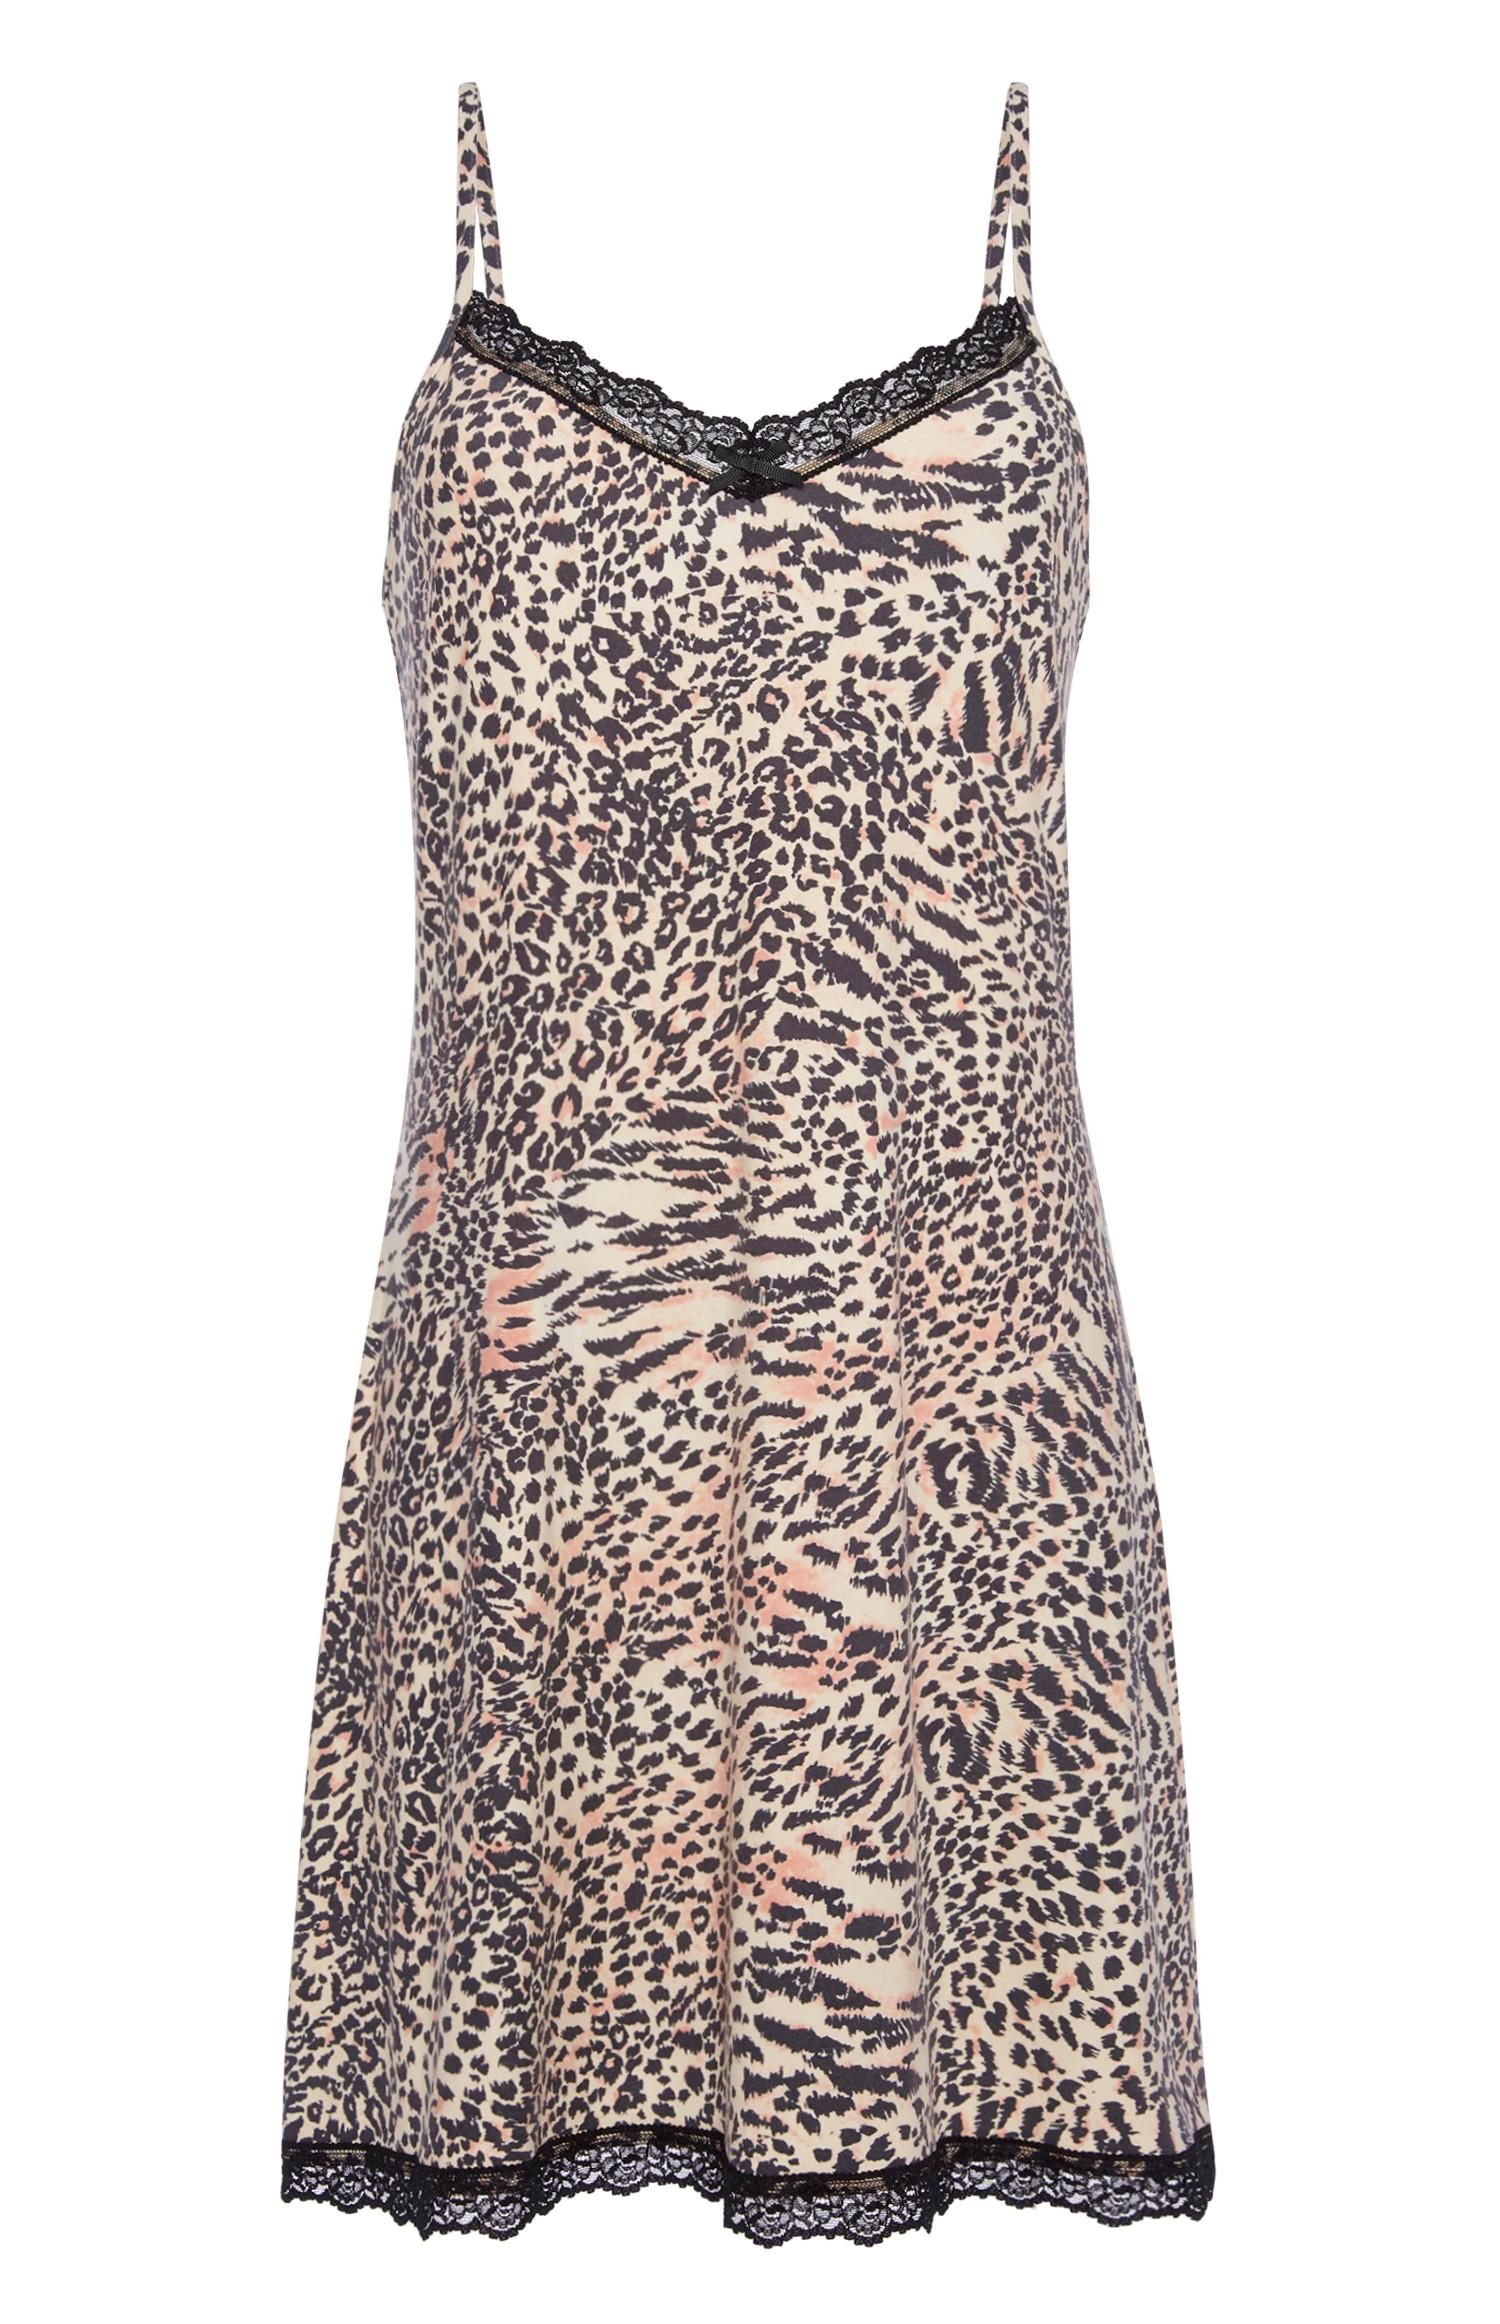 Leopard Print Chemise